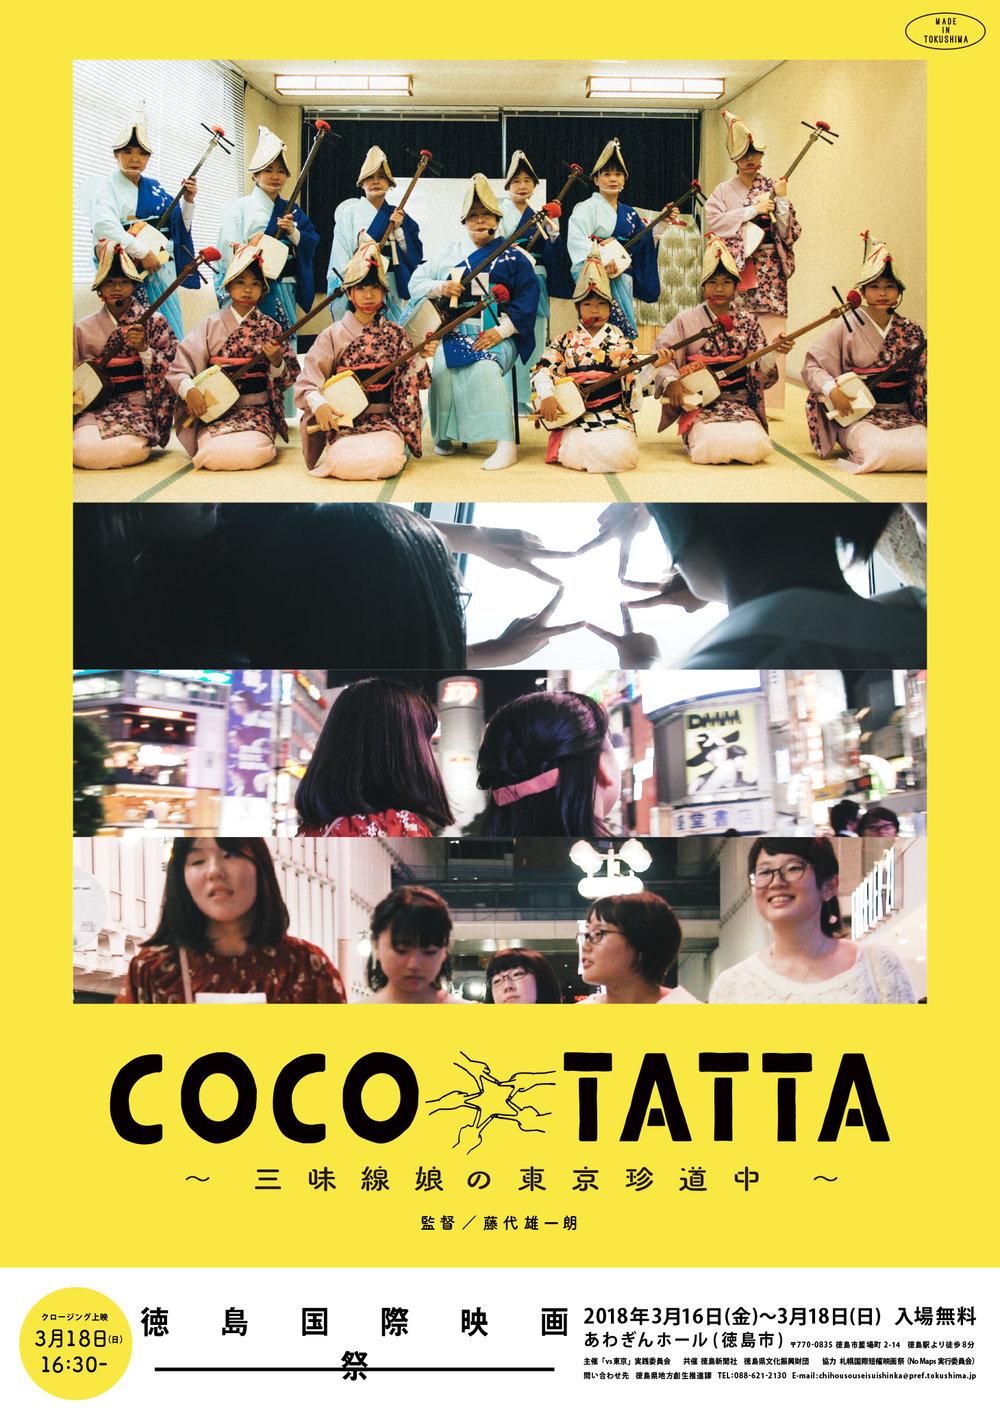 cocotatta_poster.jpg